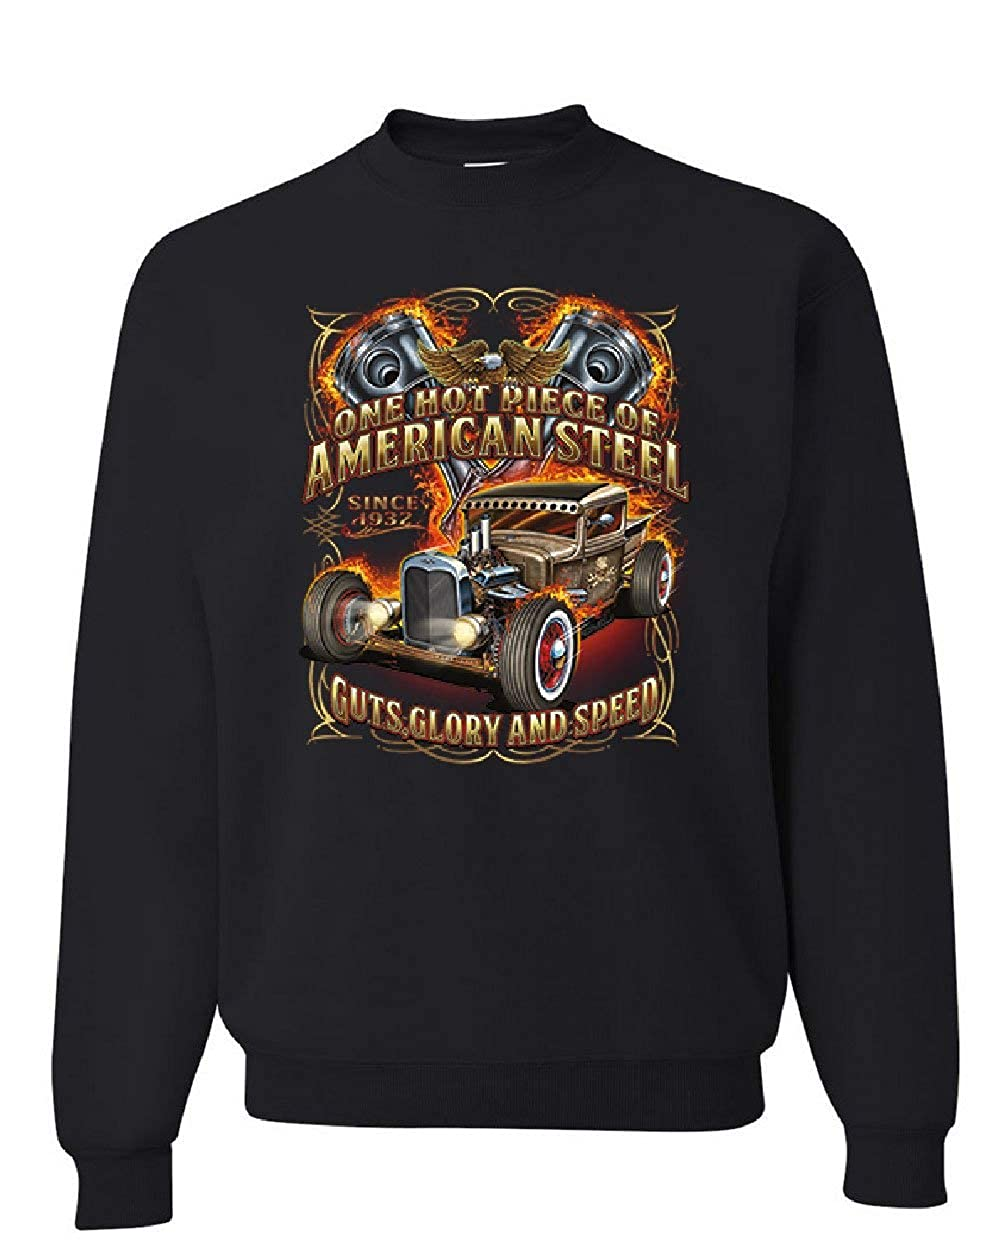 One Hot Piece of American Steel Sweatshirt Hot Rod Guts Glory Speed Sweater